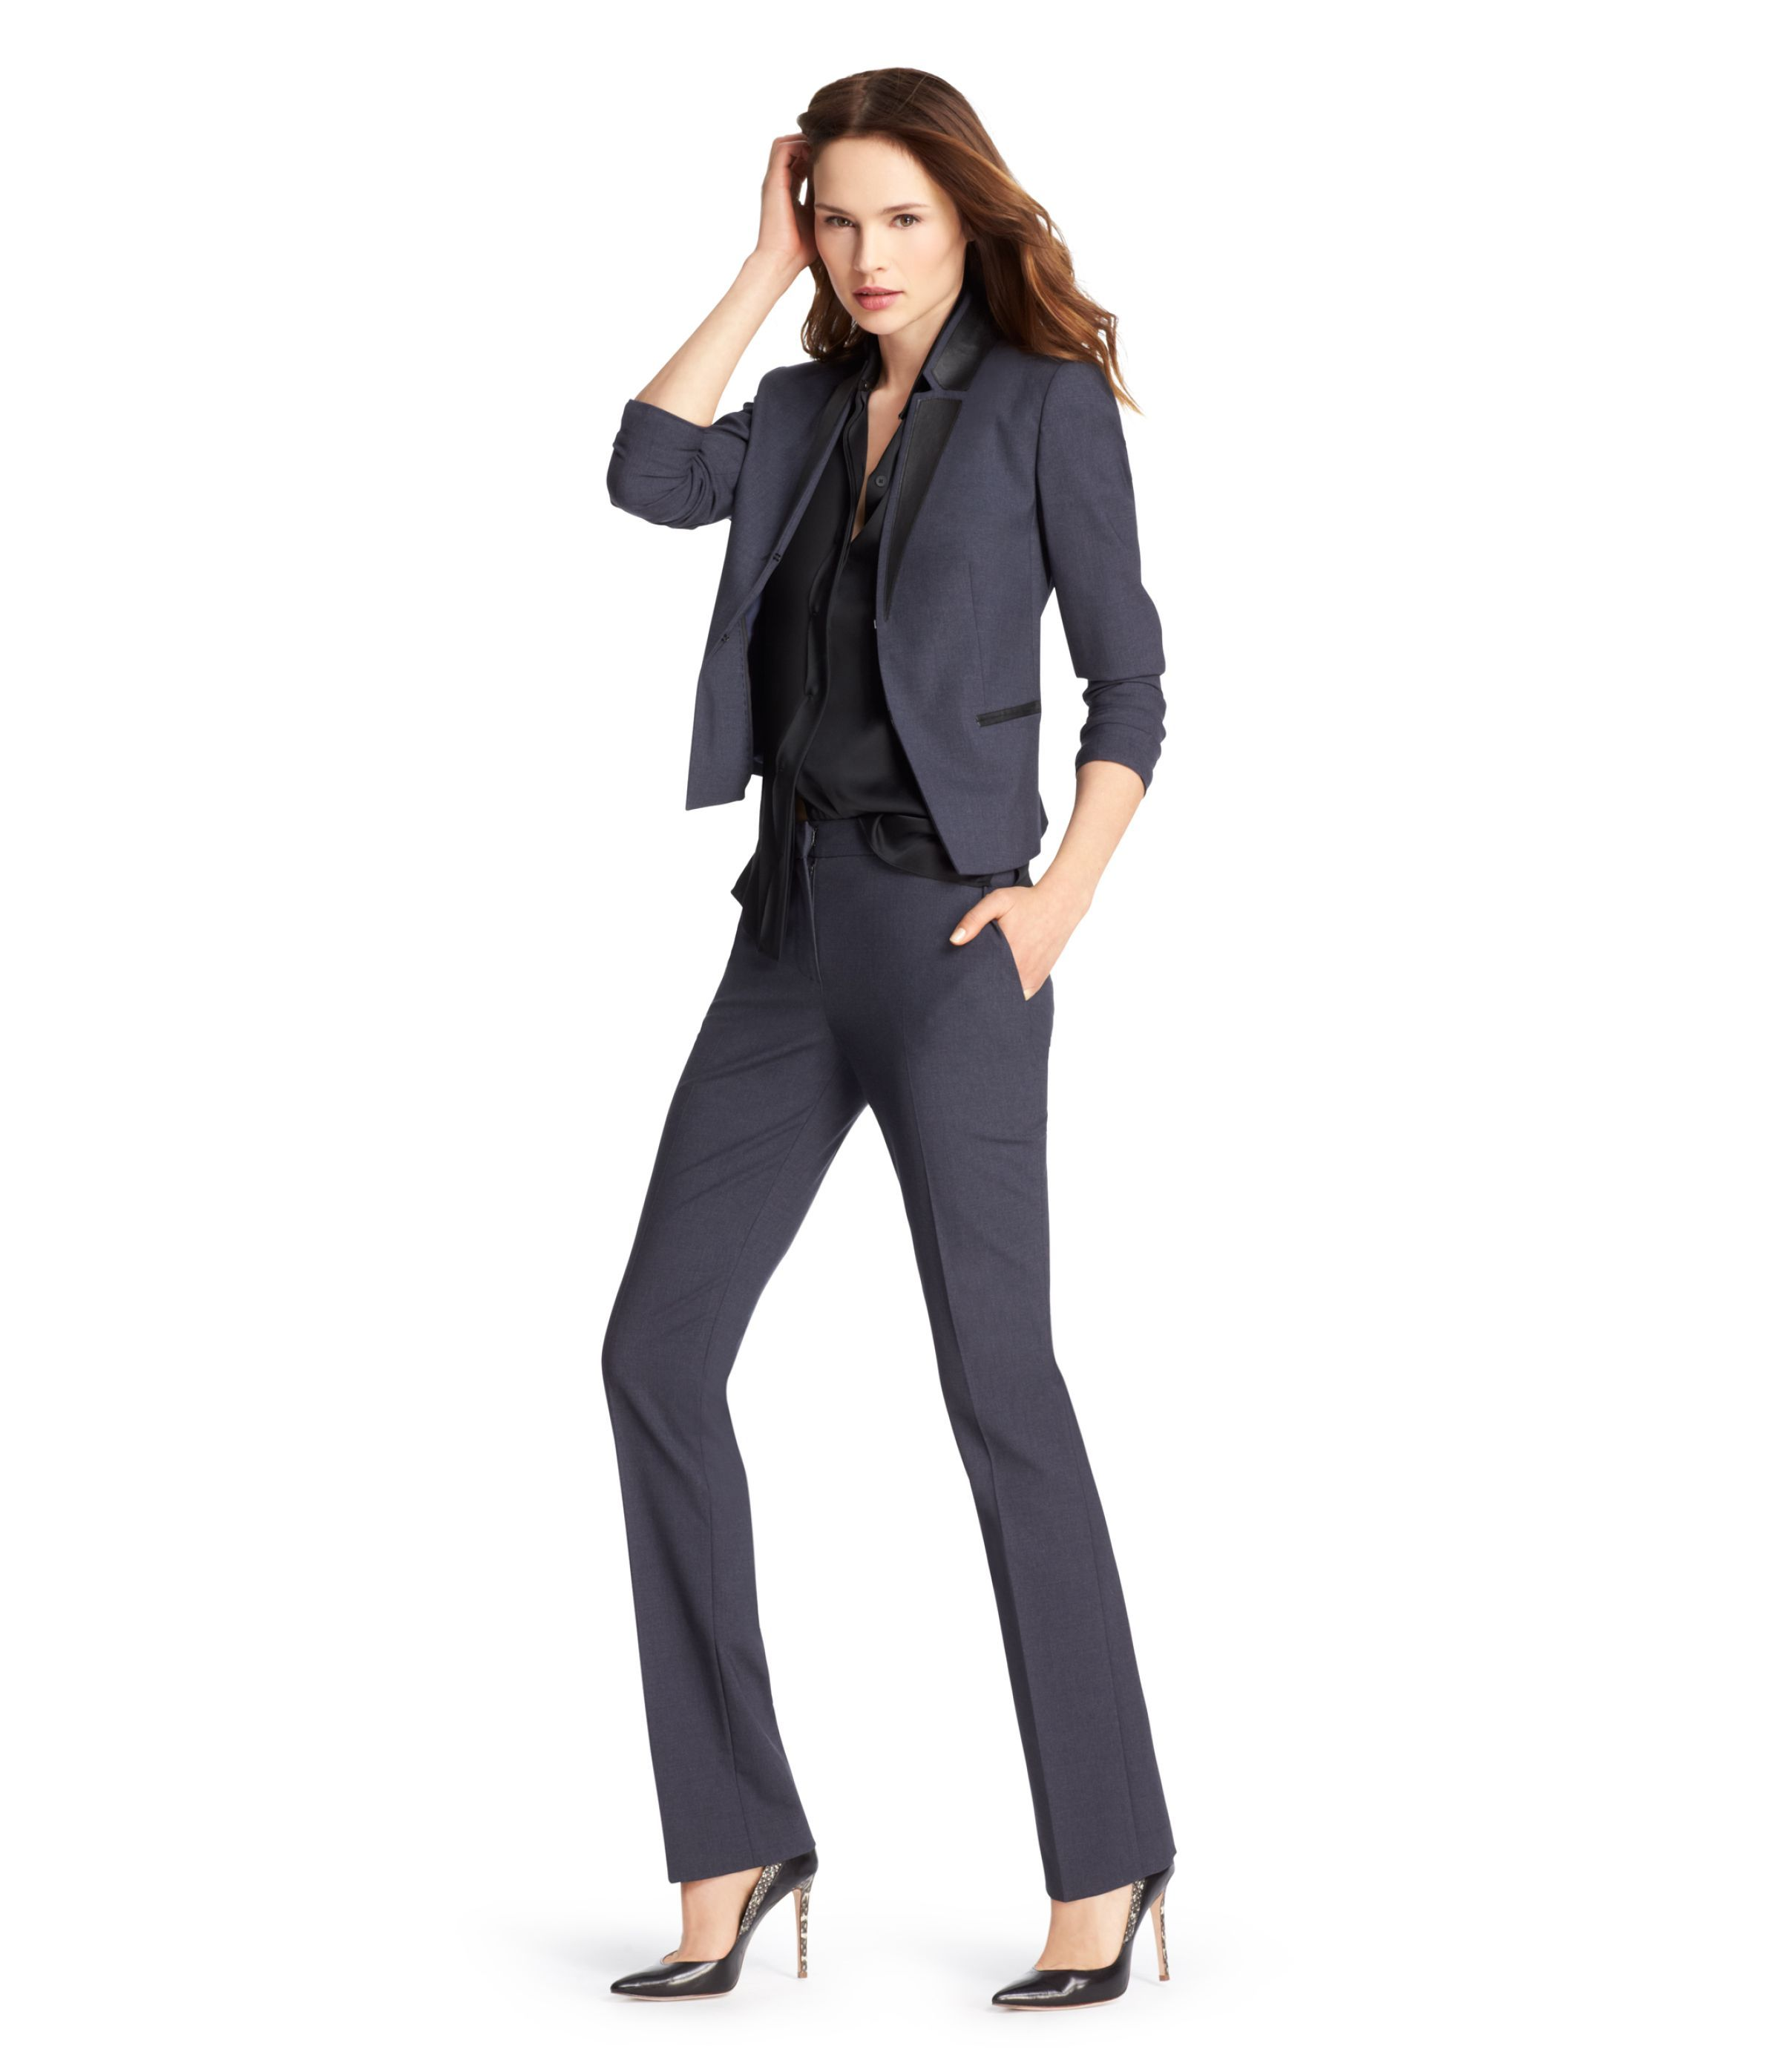 blue melange pant suit bianca jacket elie tahari 448 bc bp blue melange pant suit bianca jacket elie tahari 448